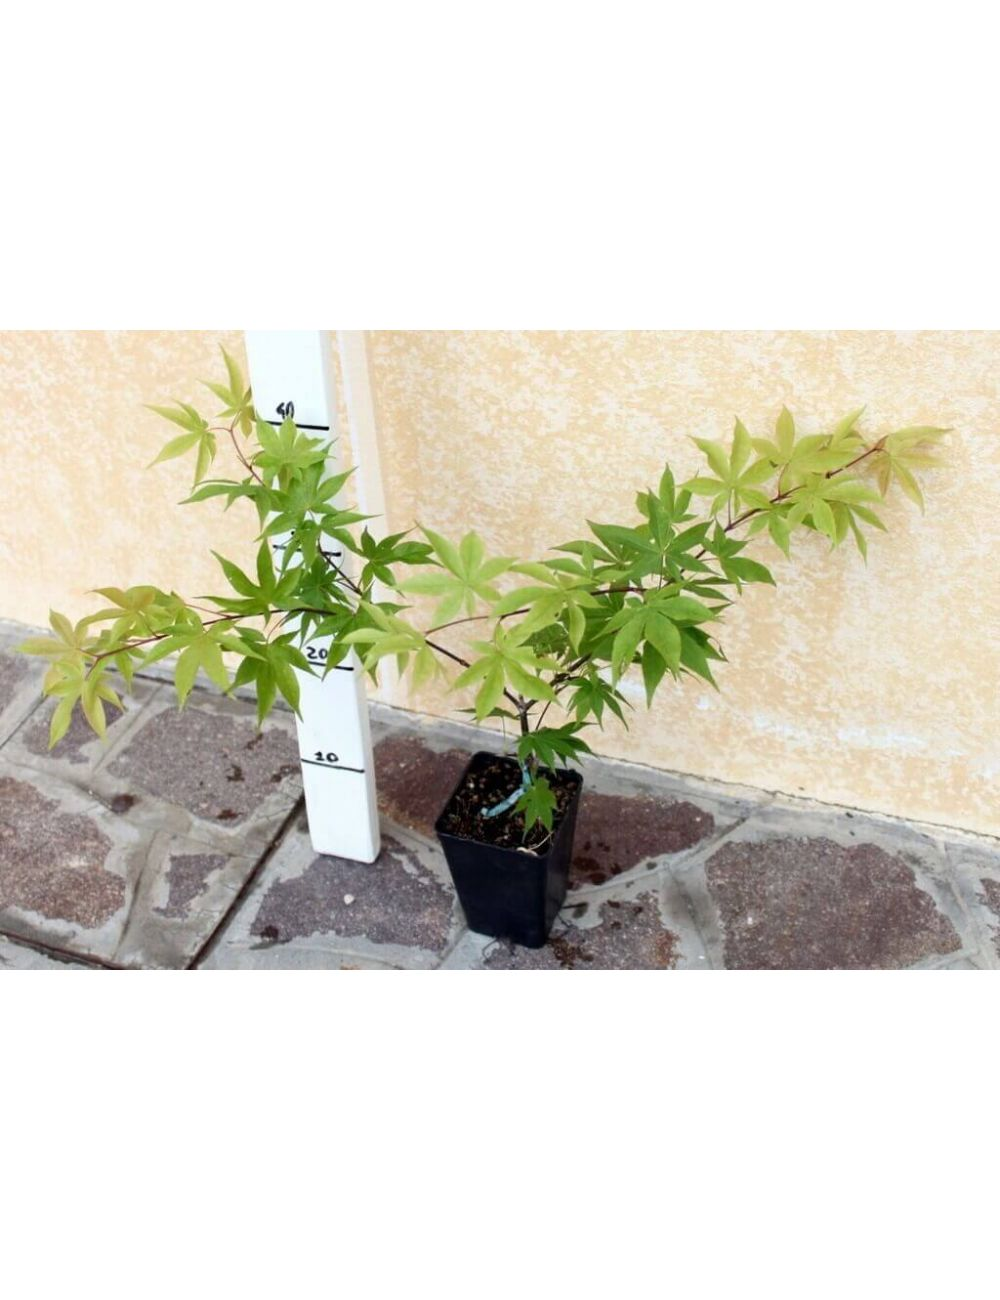 Acero giapponese osakazuki vendita piante on line for Acero giapponese nano